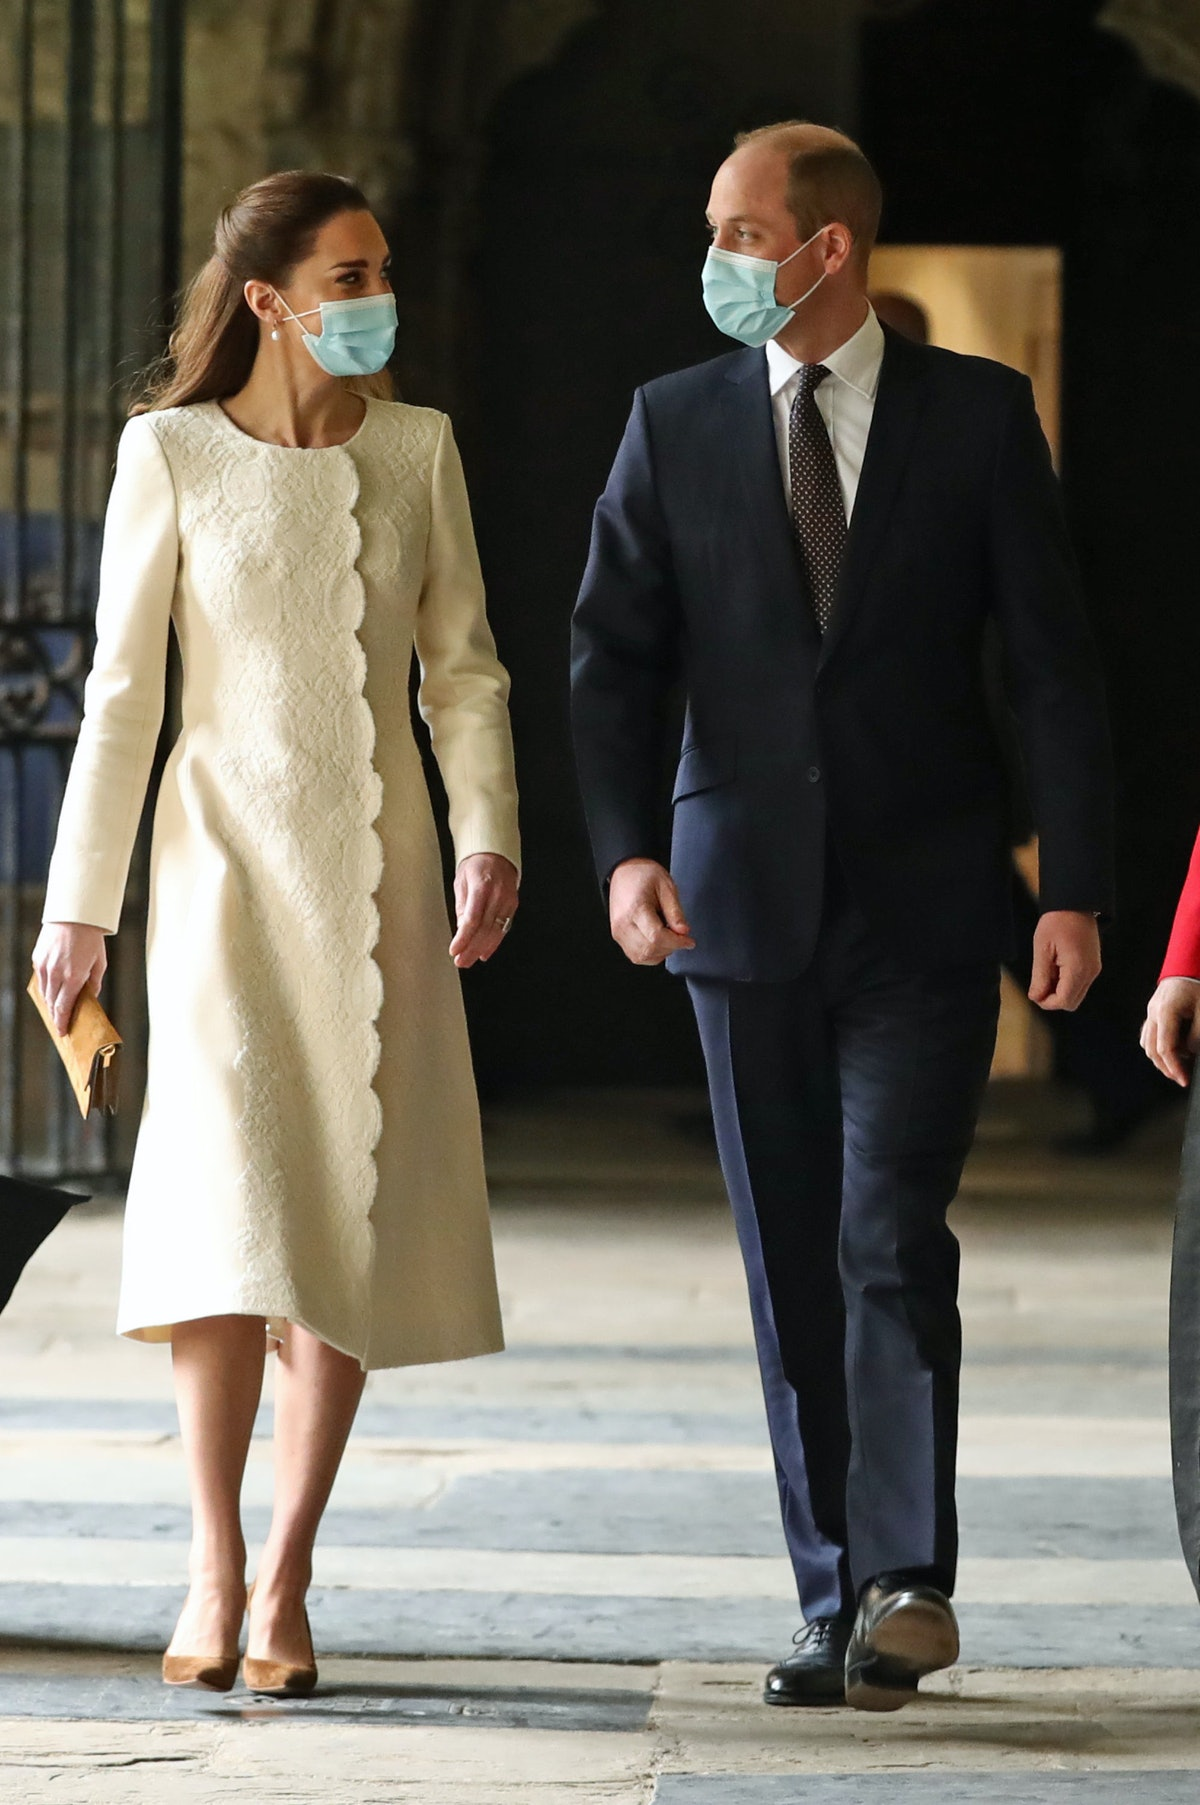 LONDON, ENGLAND - MARCH 23: Prince William, Duke of Cambridge and Catherine, Duchess of Cambridge du...